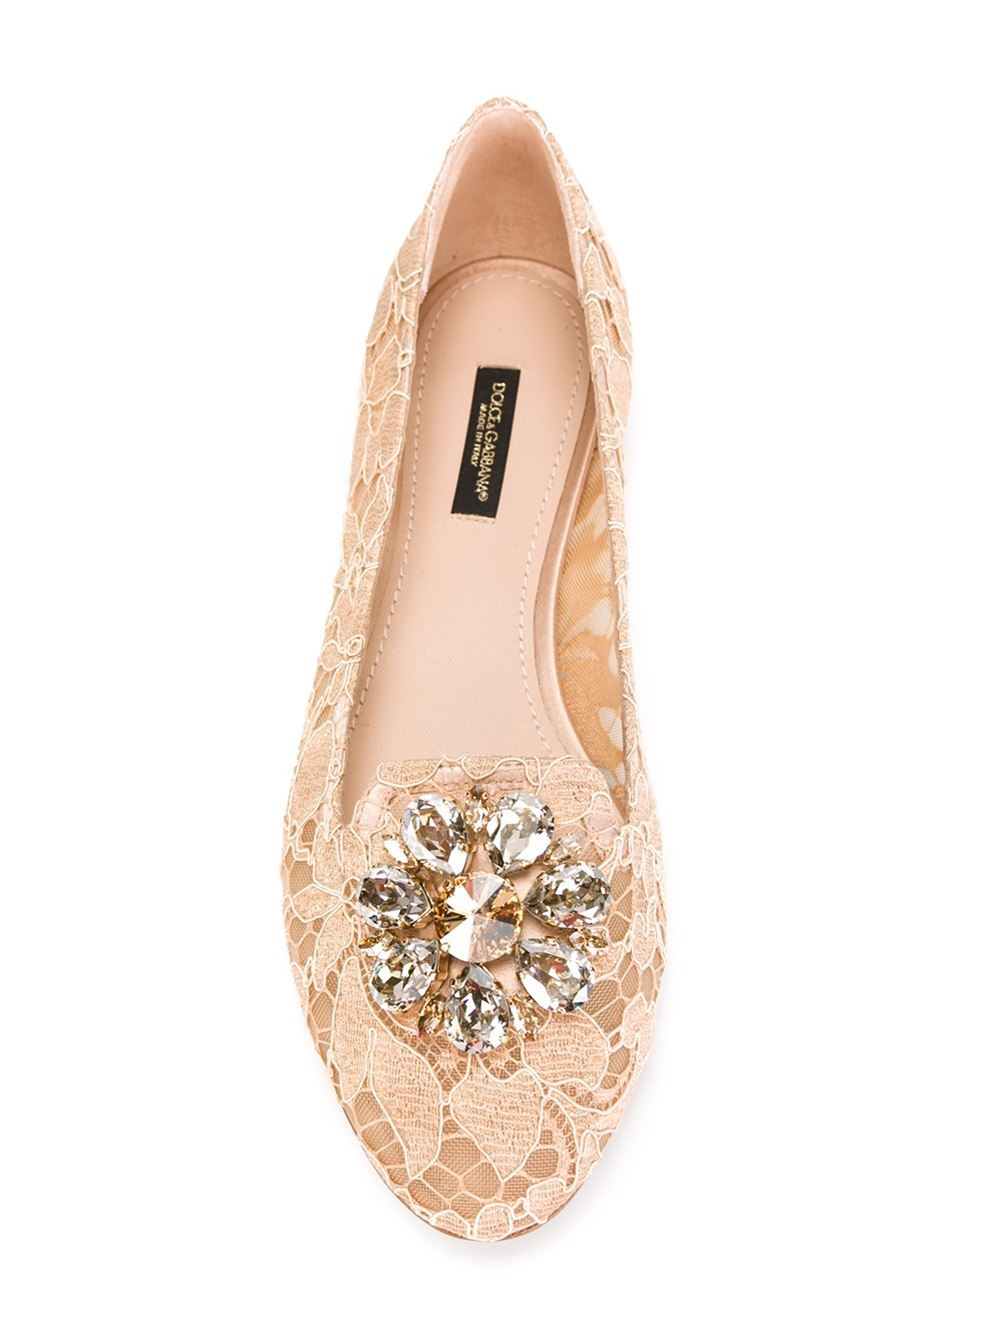 Dolce & Gabbana Vally slippers mZuUo6C6